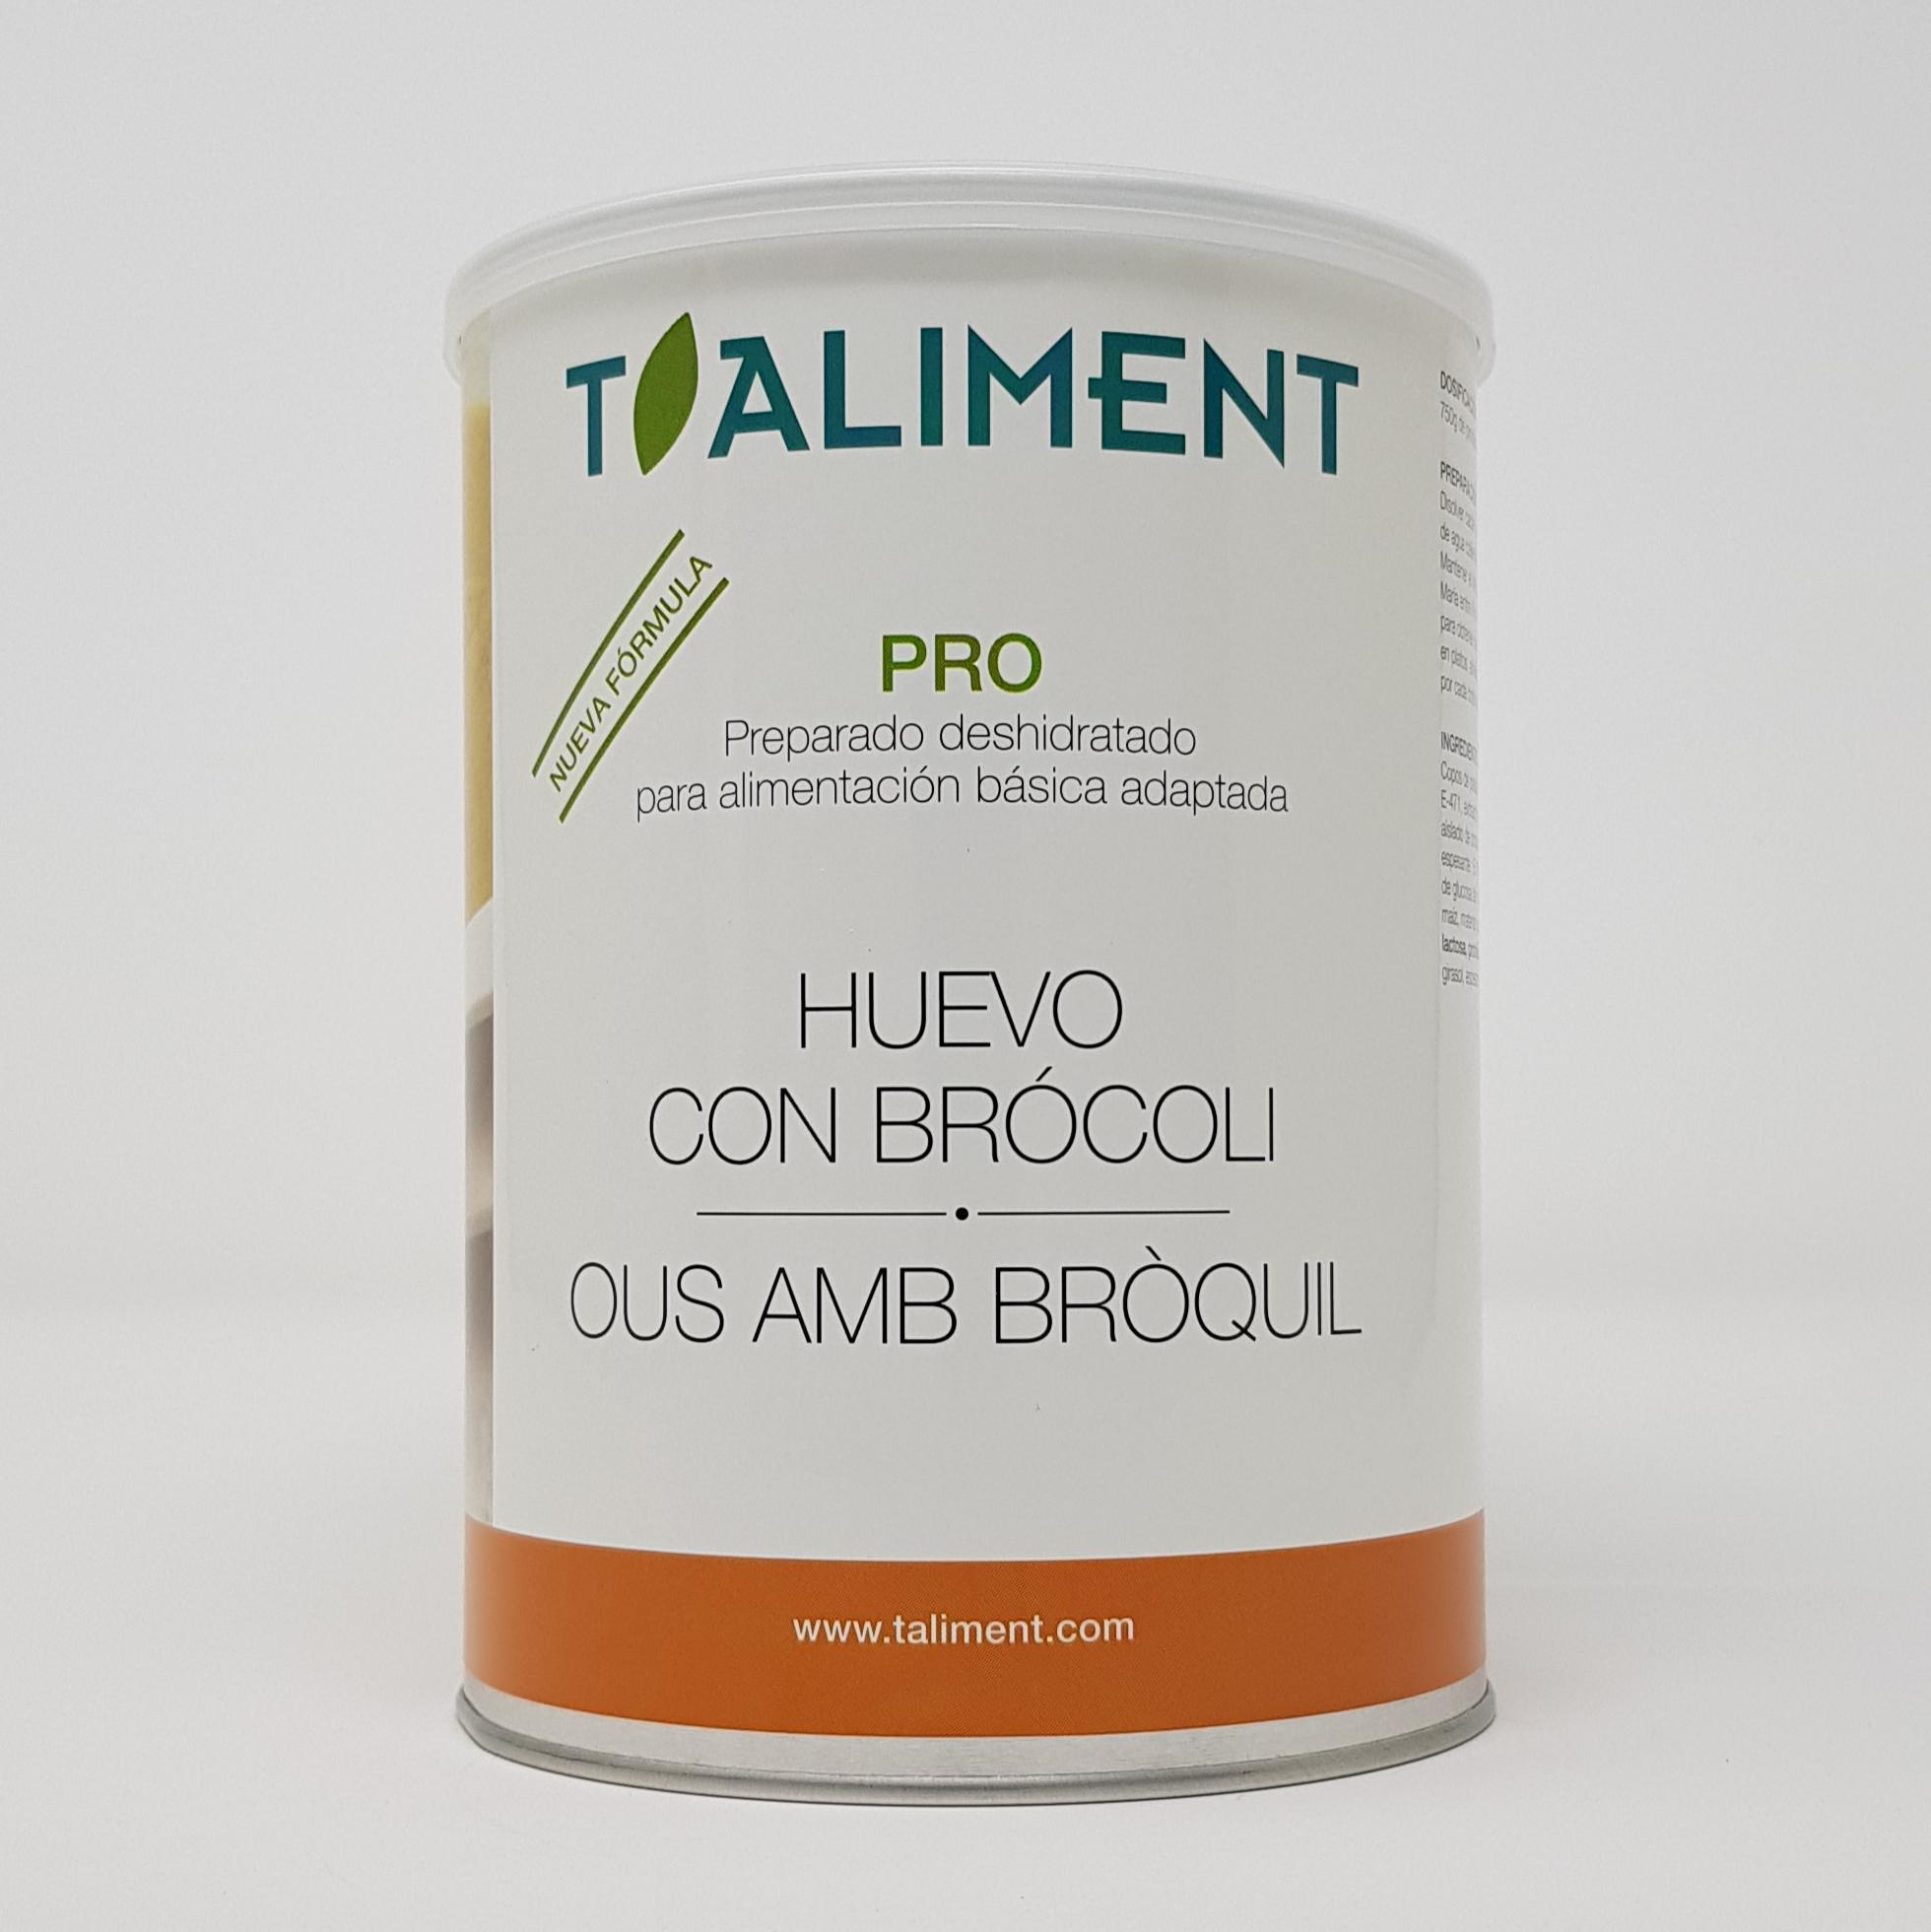 PRO Huevo con Brócoli